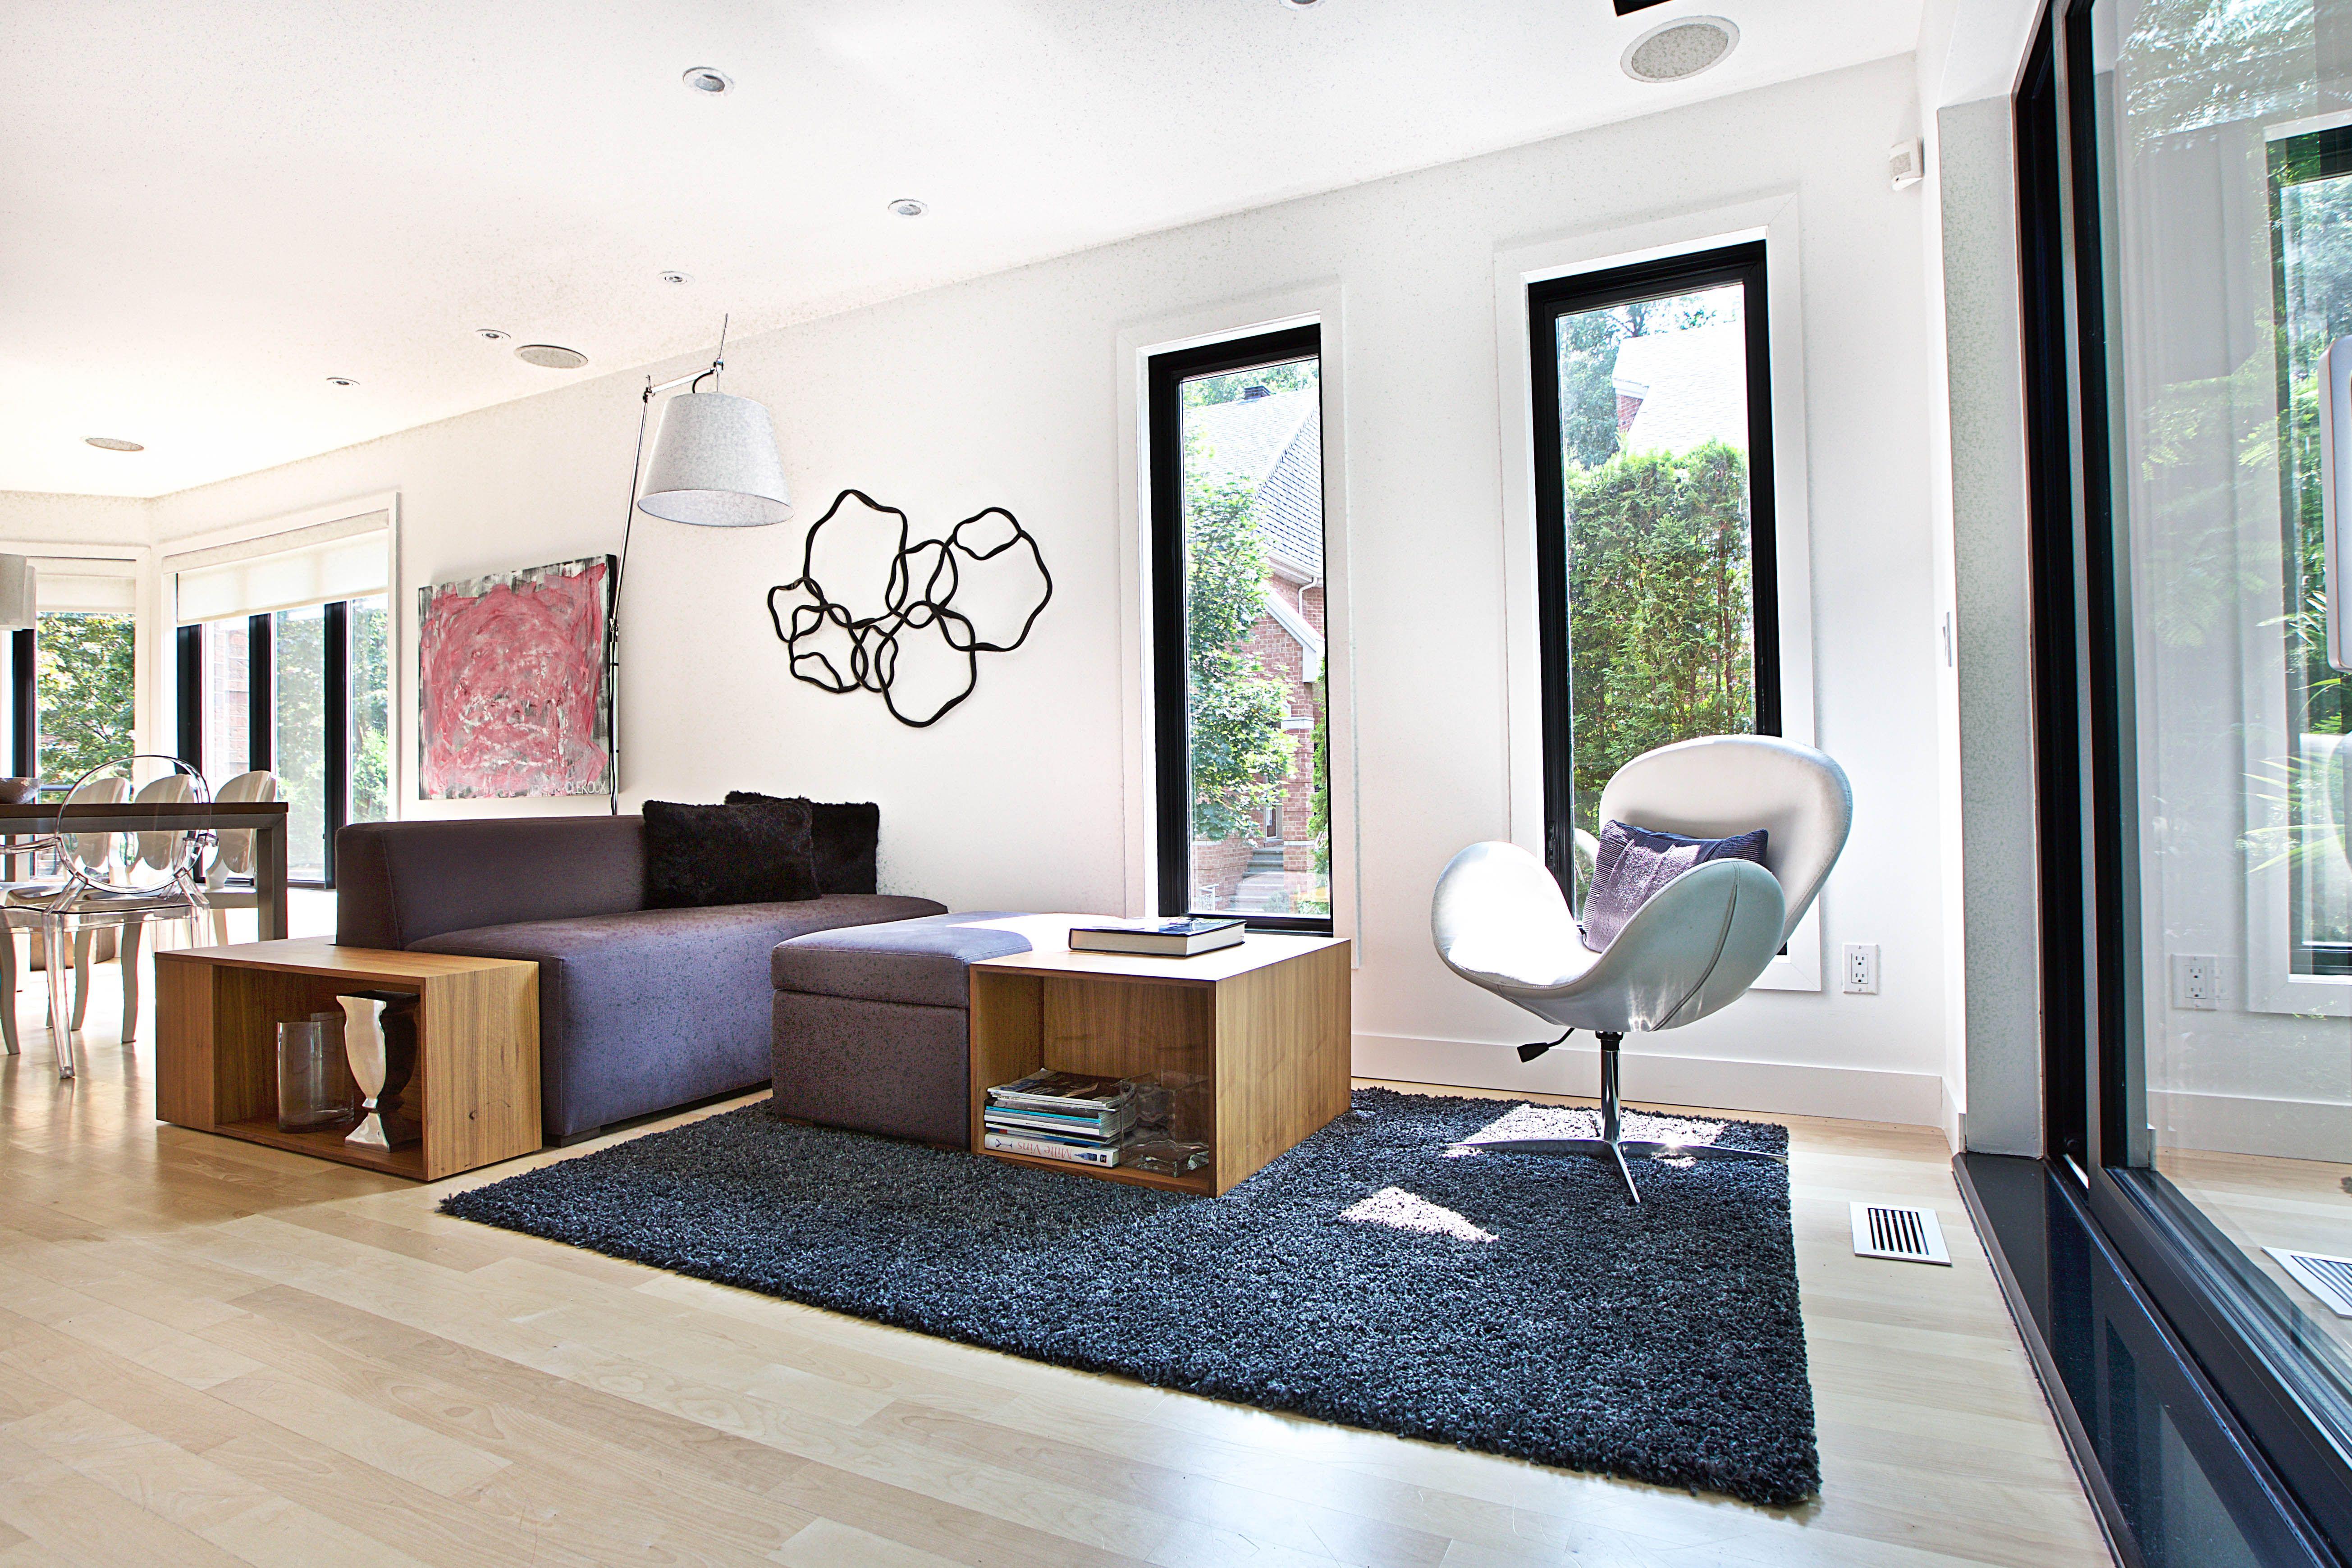 Architecture Design Salon Salle familiale Tapis Mobilier